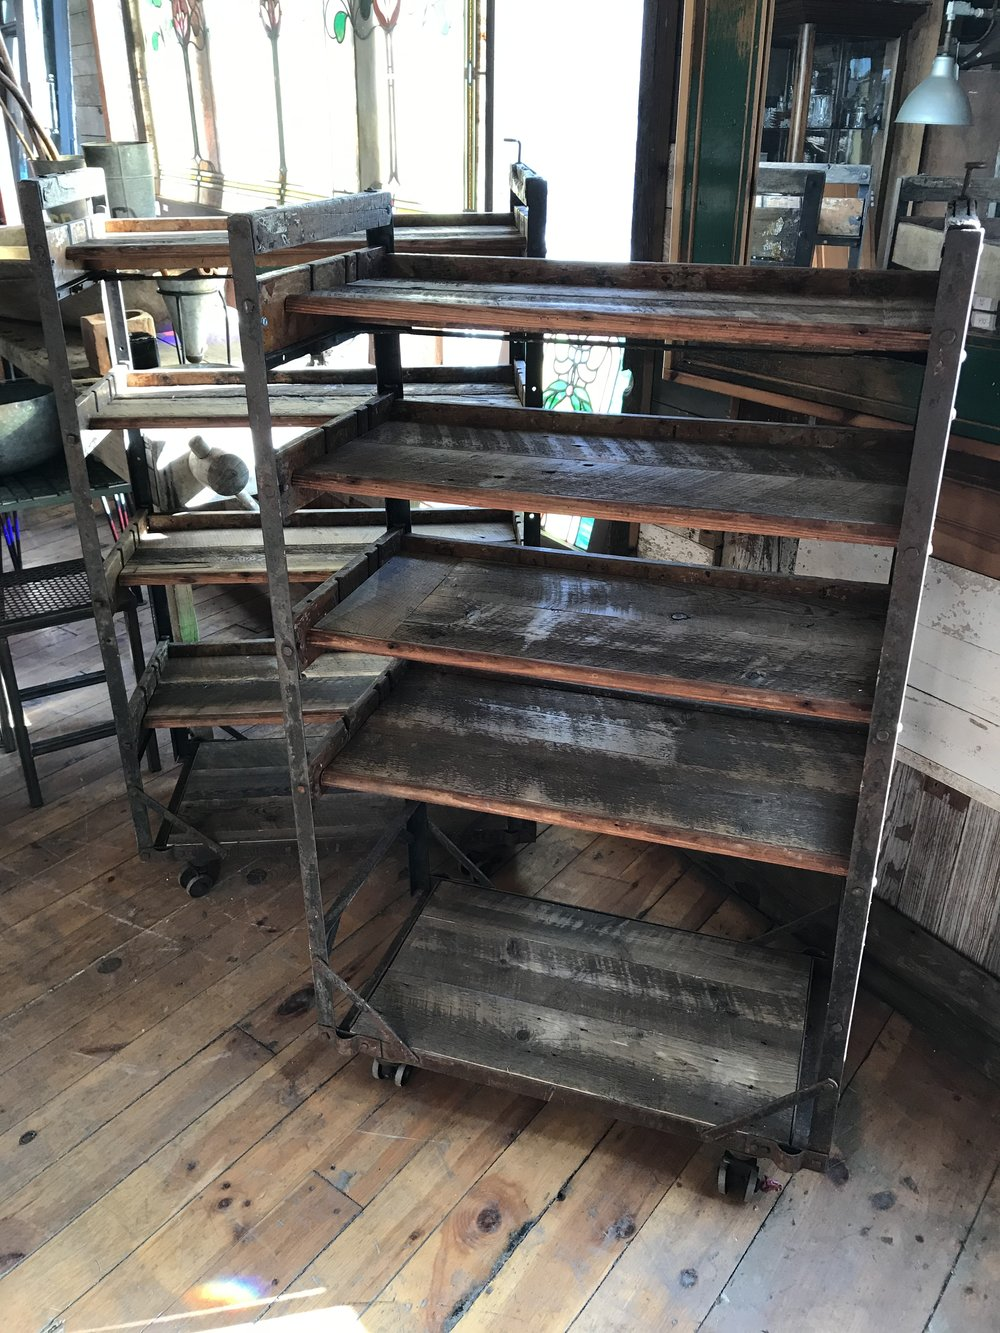 Antique Steel framed Shoe Racks with Casters